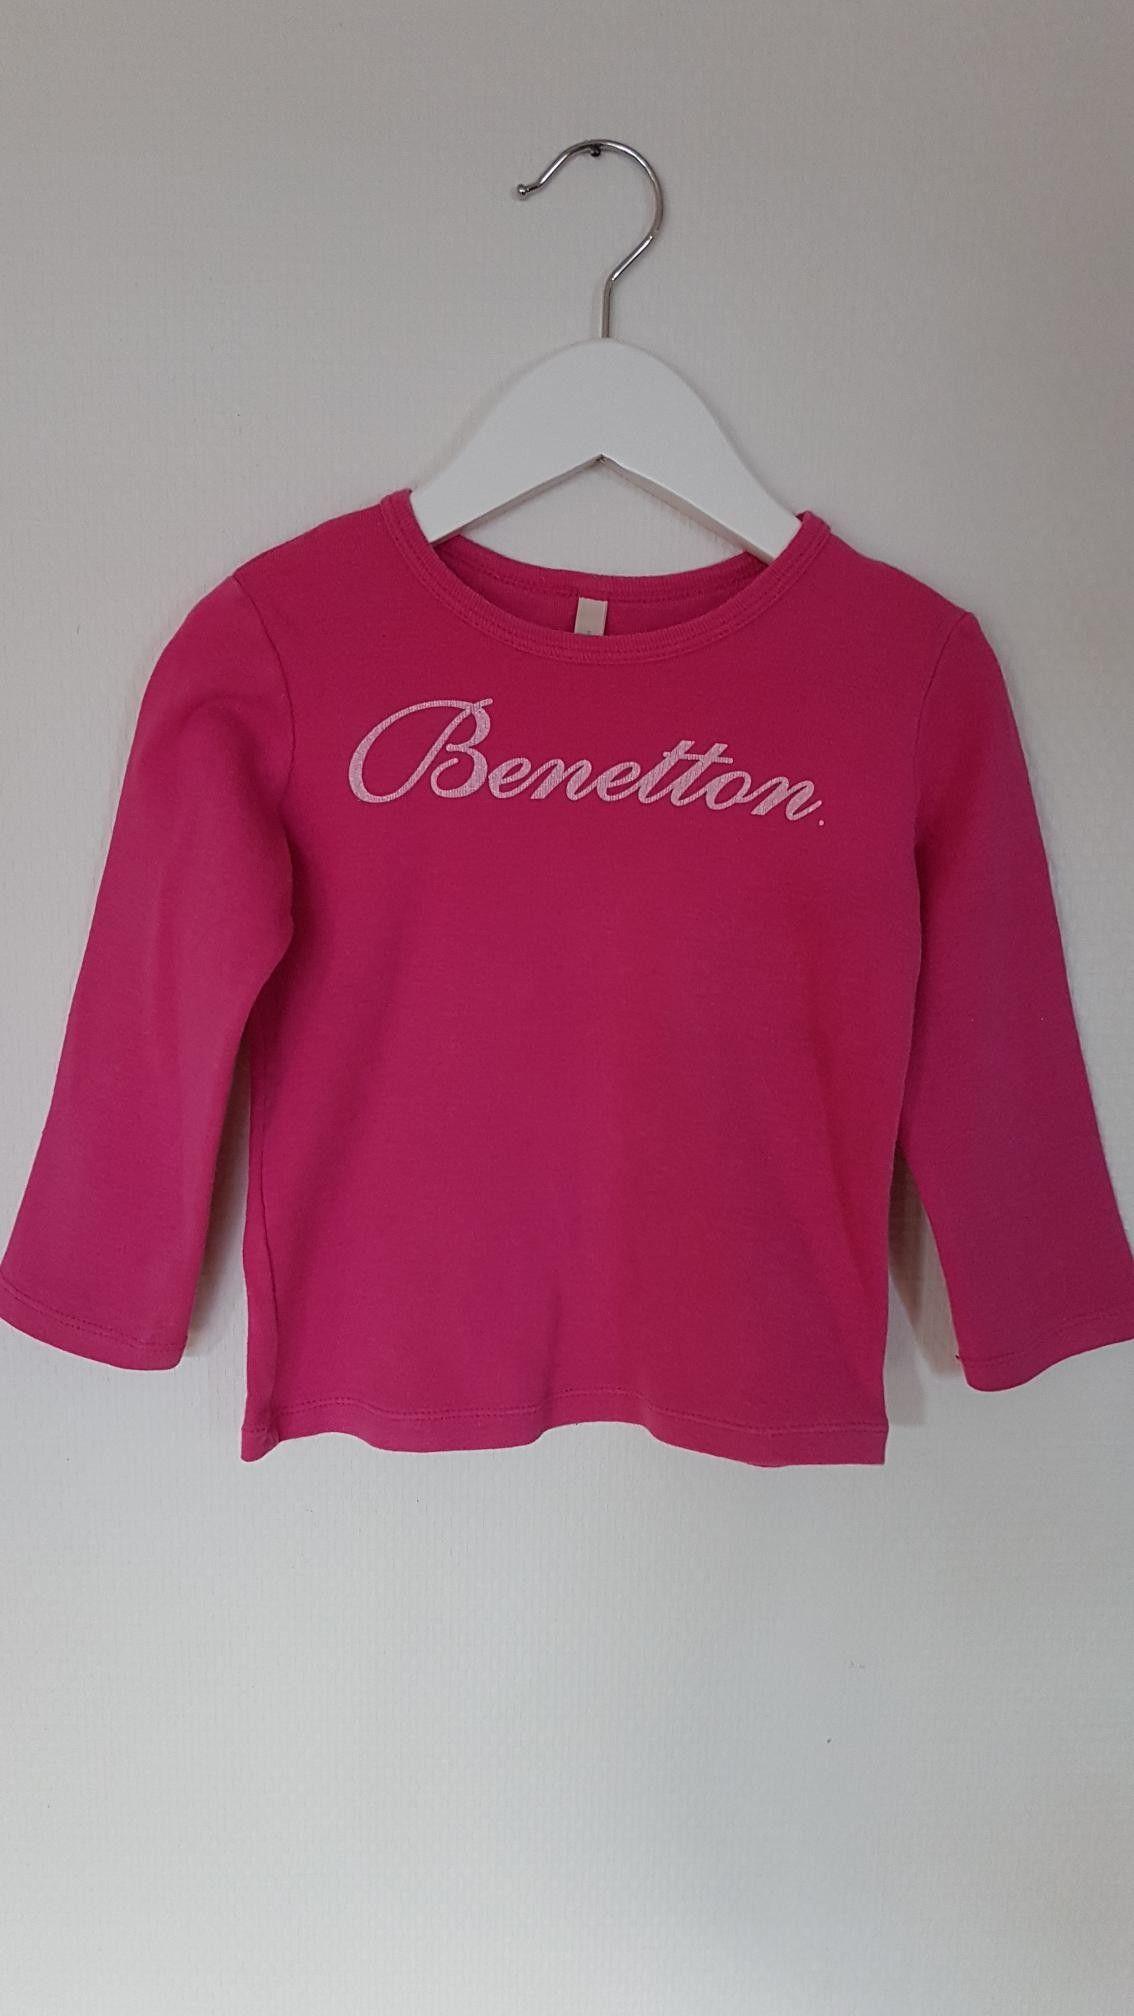 Benetton genser str M | FINN.no